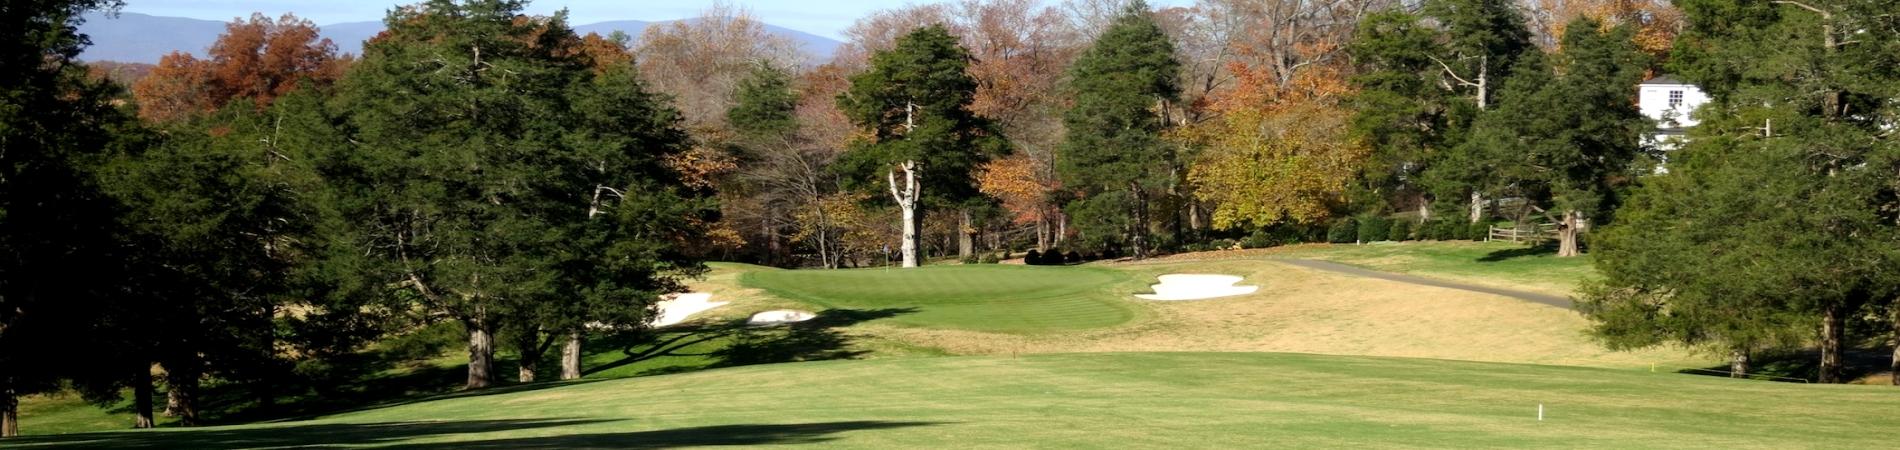 GolfFarmingtonFairway